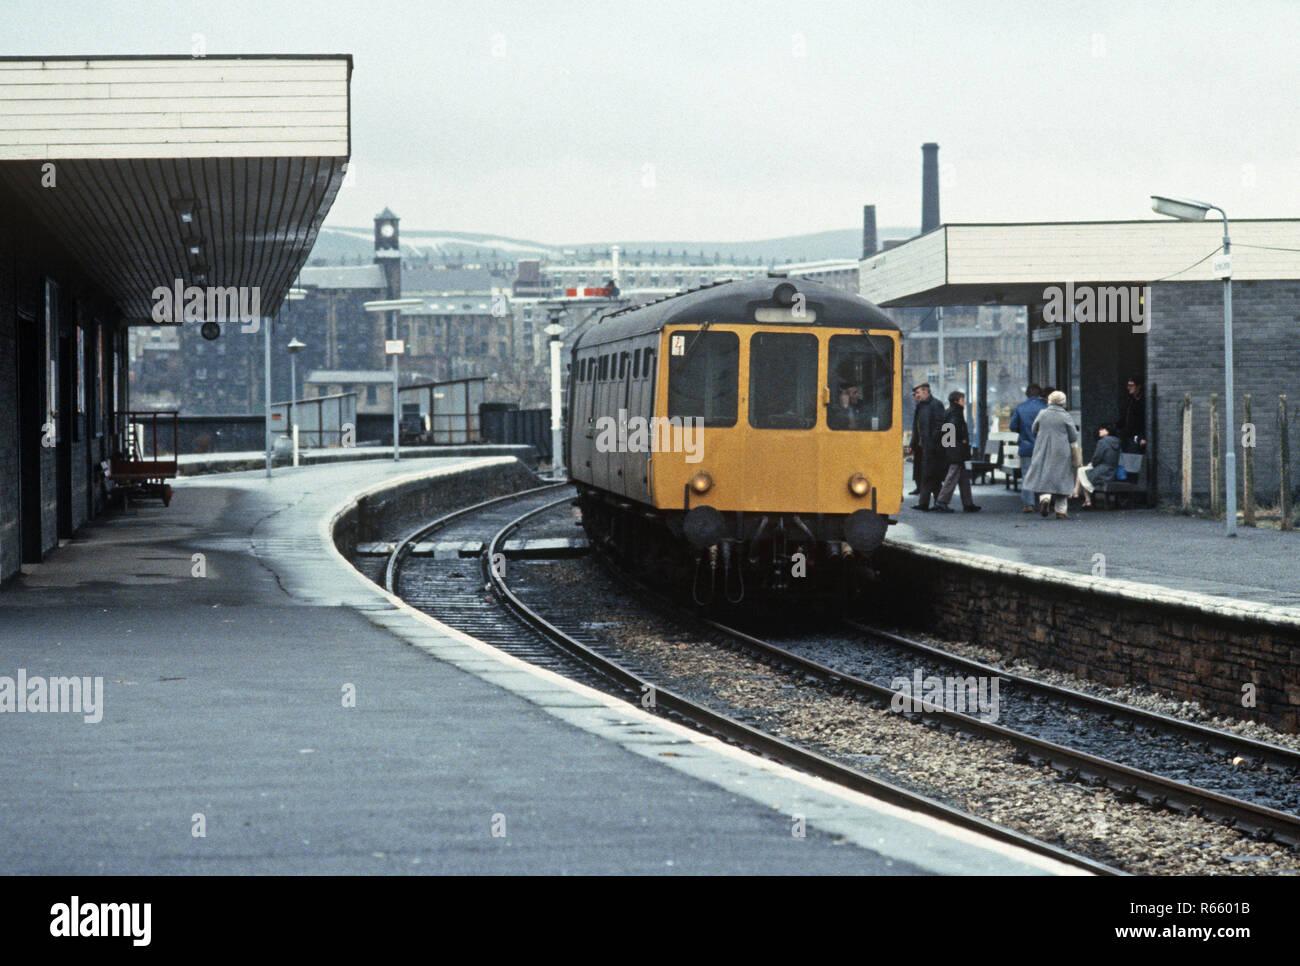 Burnley station on the British Rail Preston to Colne railway line, Lancashire, Great Britain - Stock Image